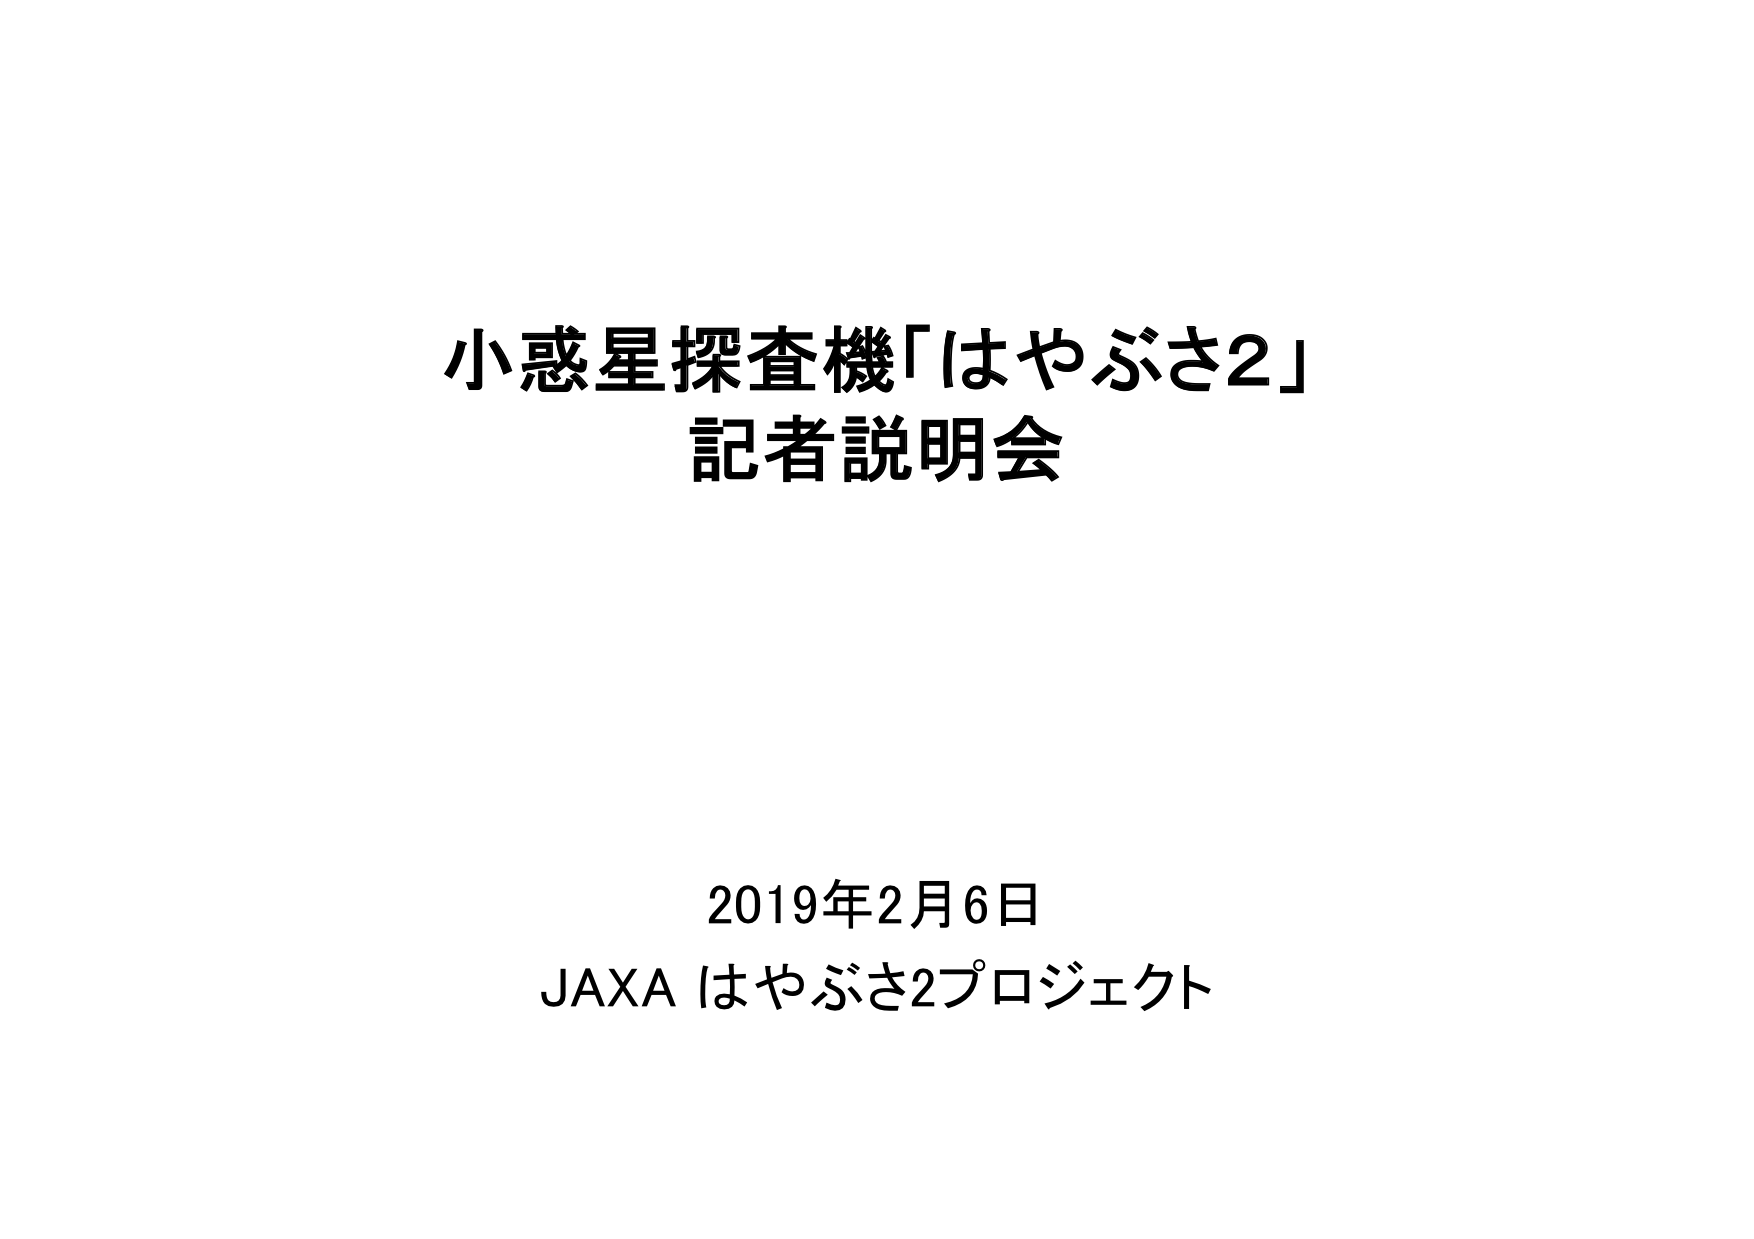 f:id:Imamura:20190204175455p:plain